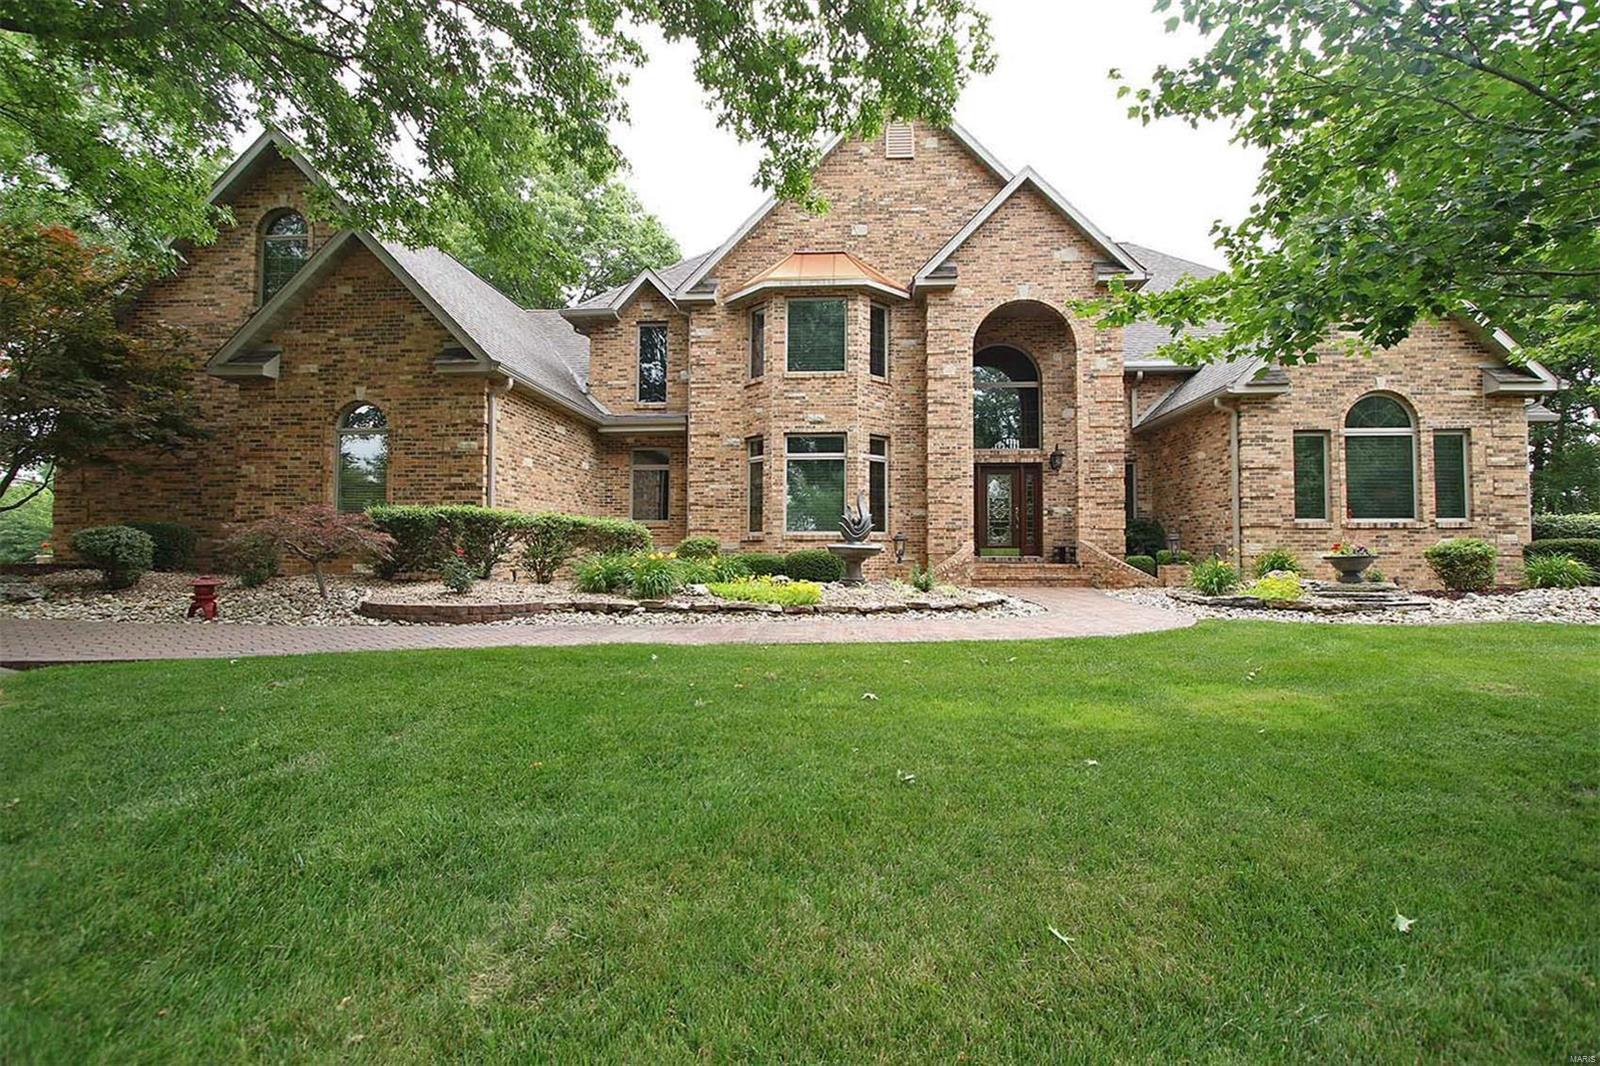 6629 Fox View Drive Property Photo - Edwardsville, IL real estate listing